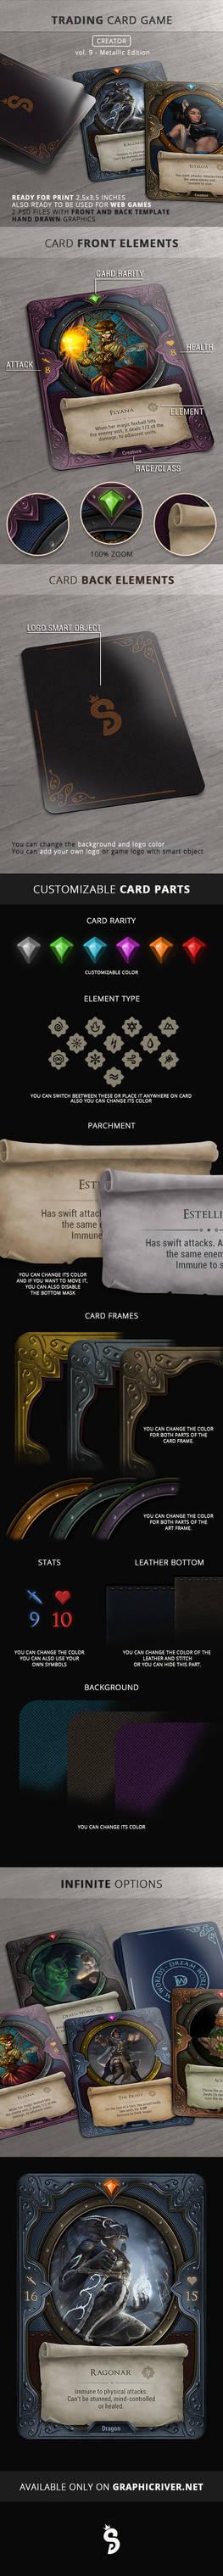 Trading Card Game - Creator - vol.9